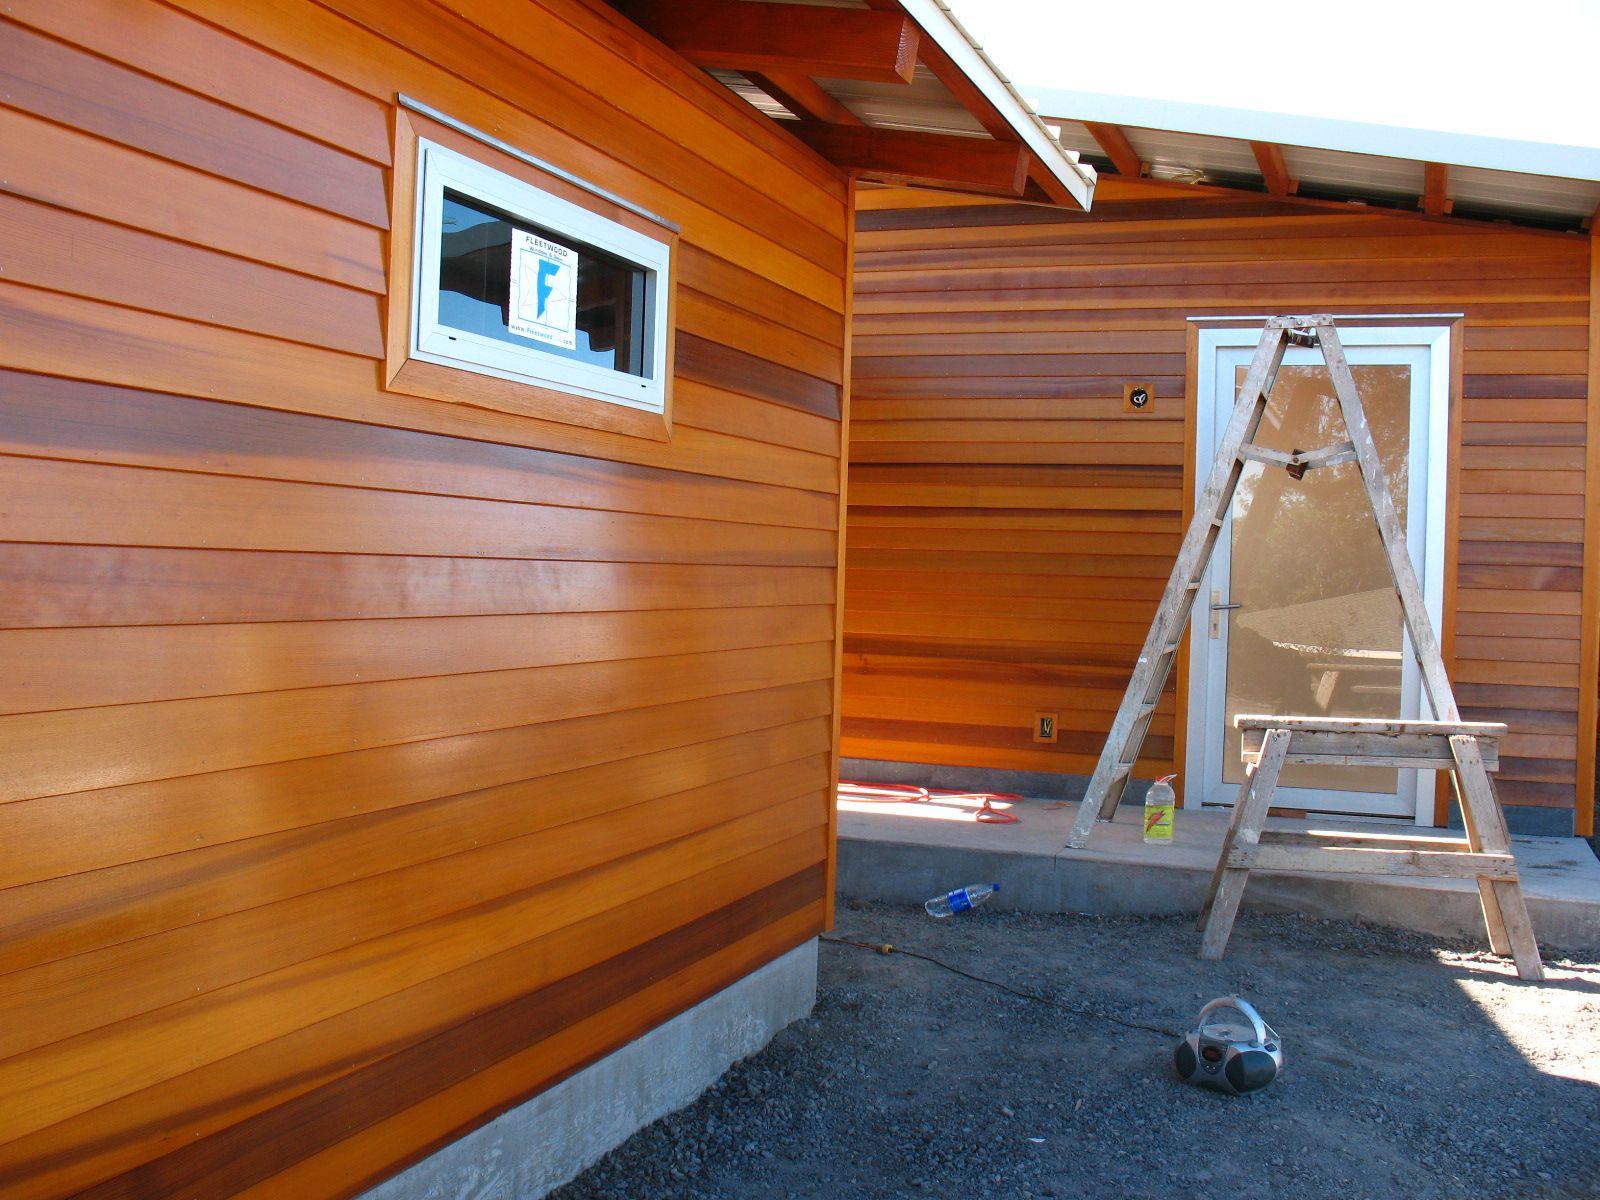 ^ 1000+ images about House exterior on Pinterest edar homes, Log ...